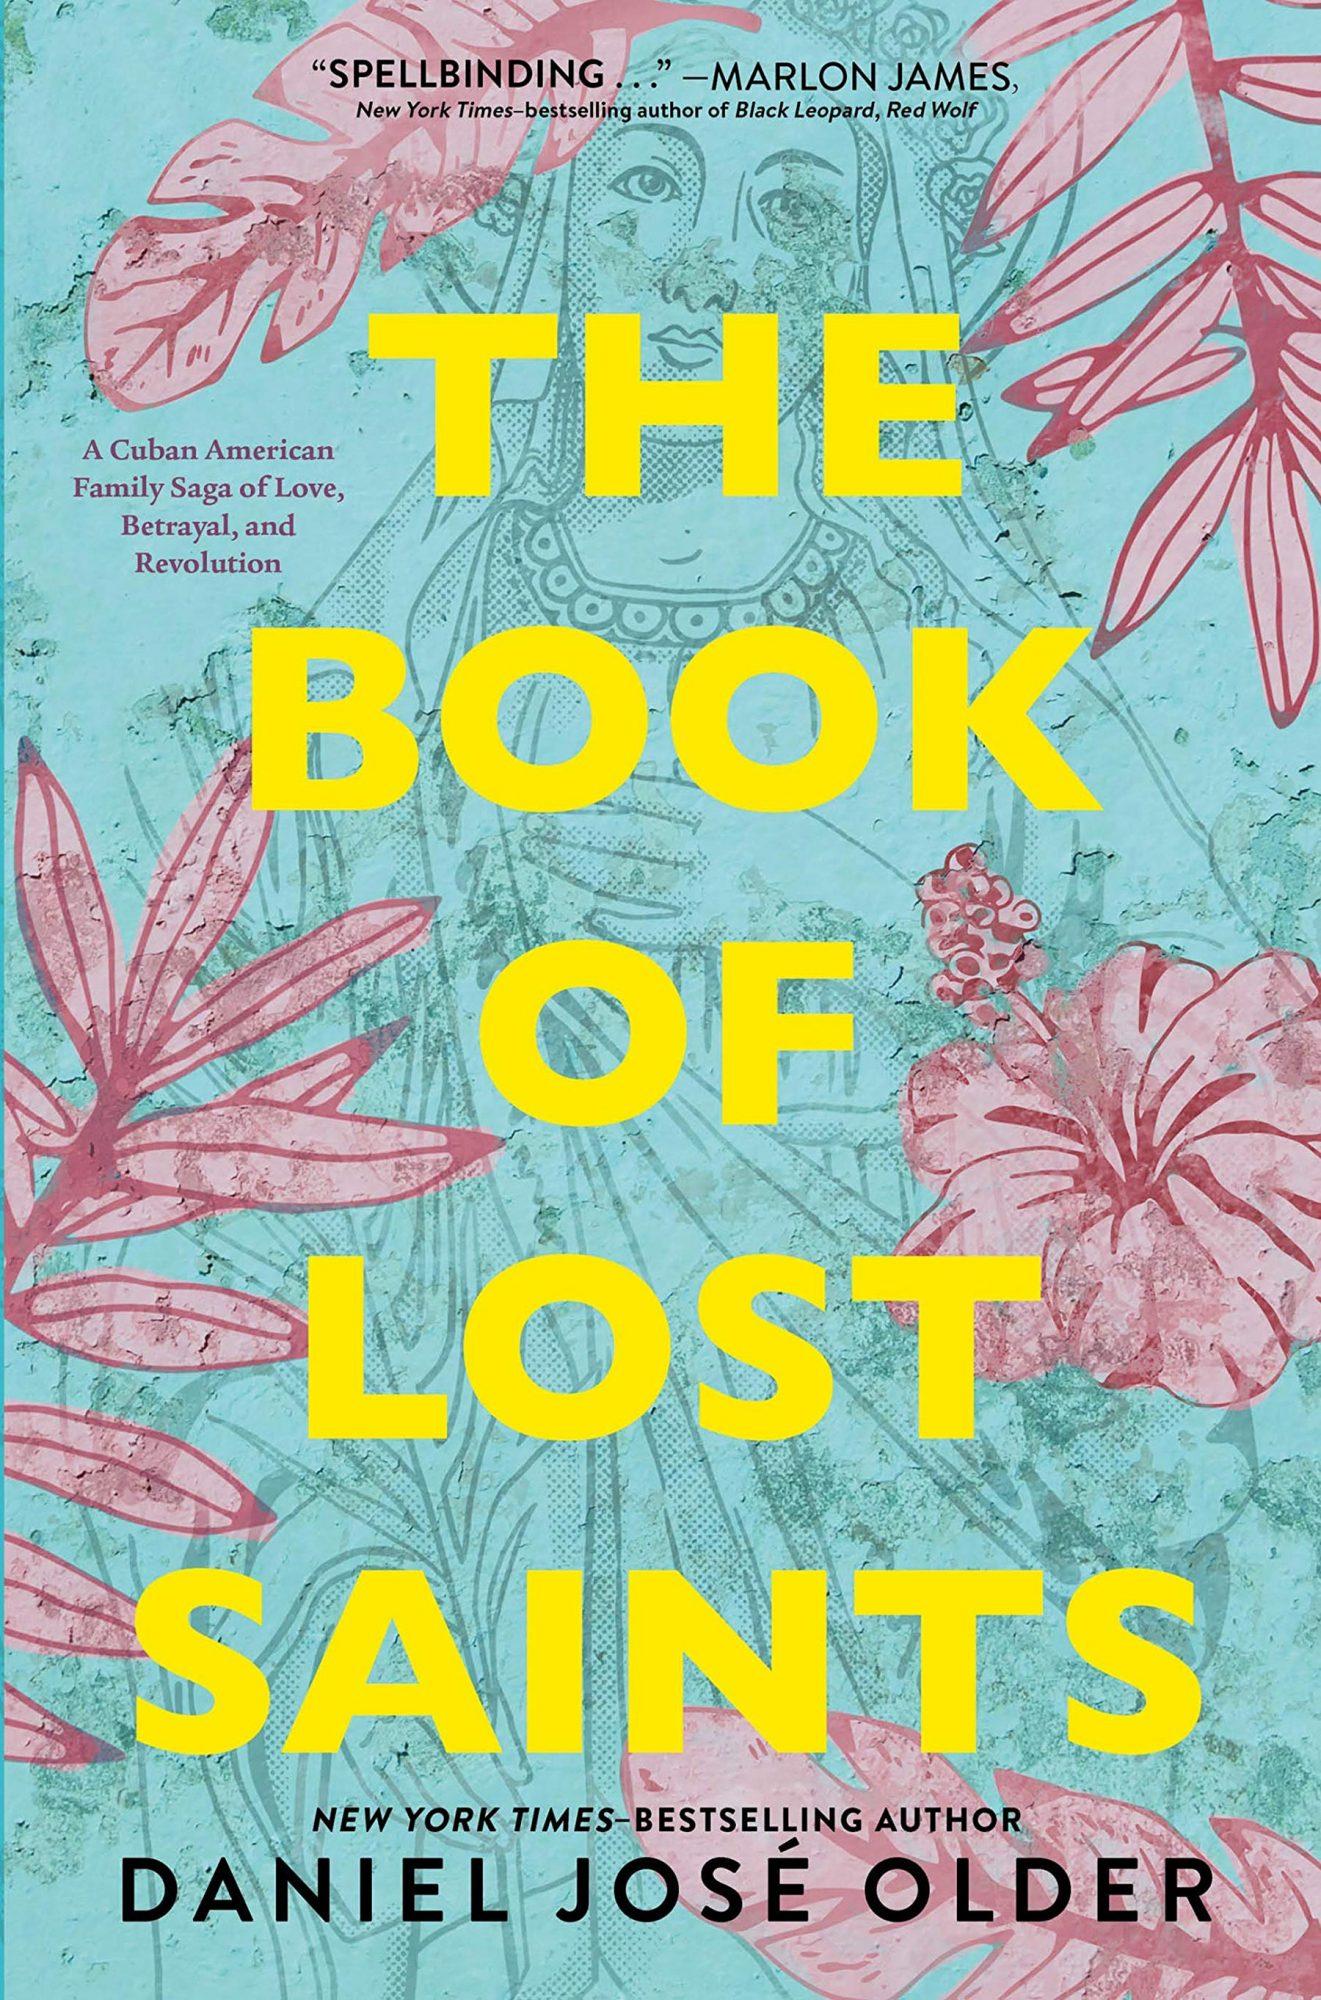 Daniel Jose Older, The Book of Lost Saints Publisher: Imprint